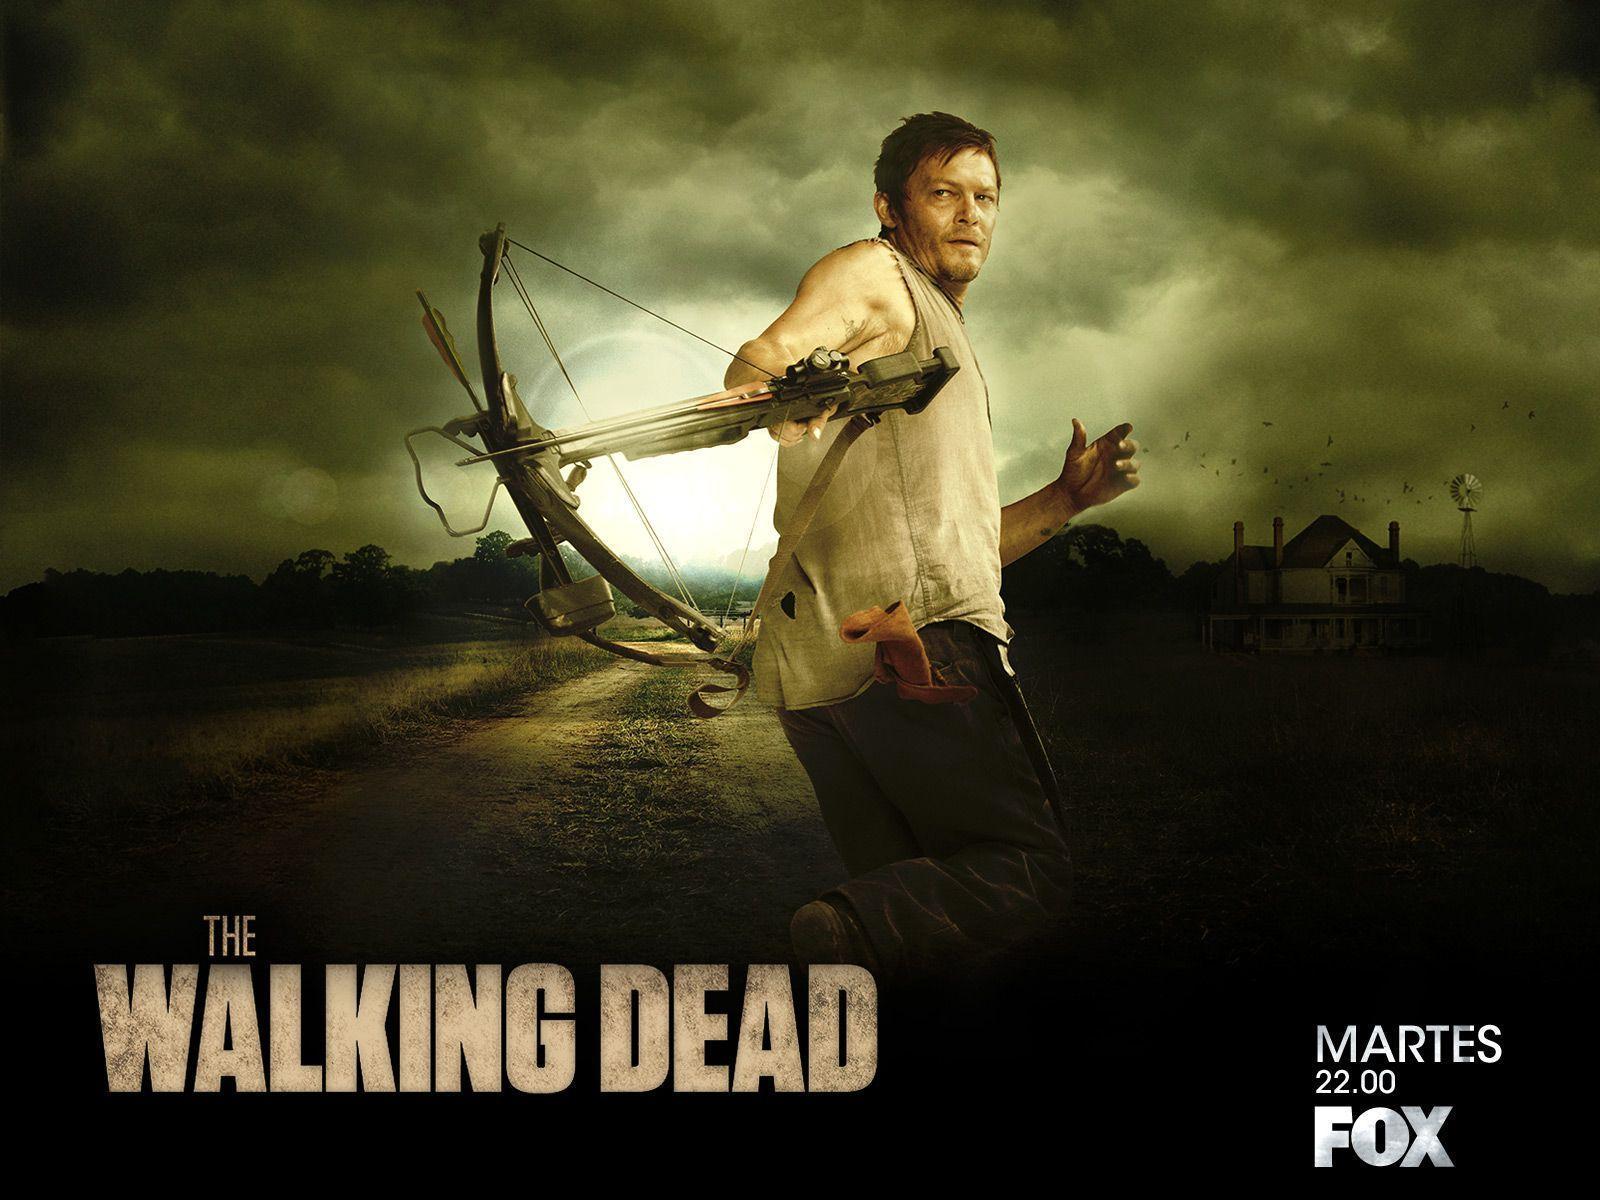 Daryl Dixon The Walking Dead Wallpapers Wallpaper Cave